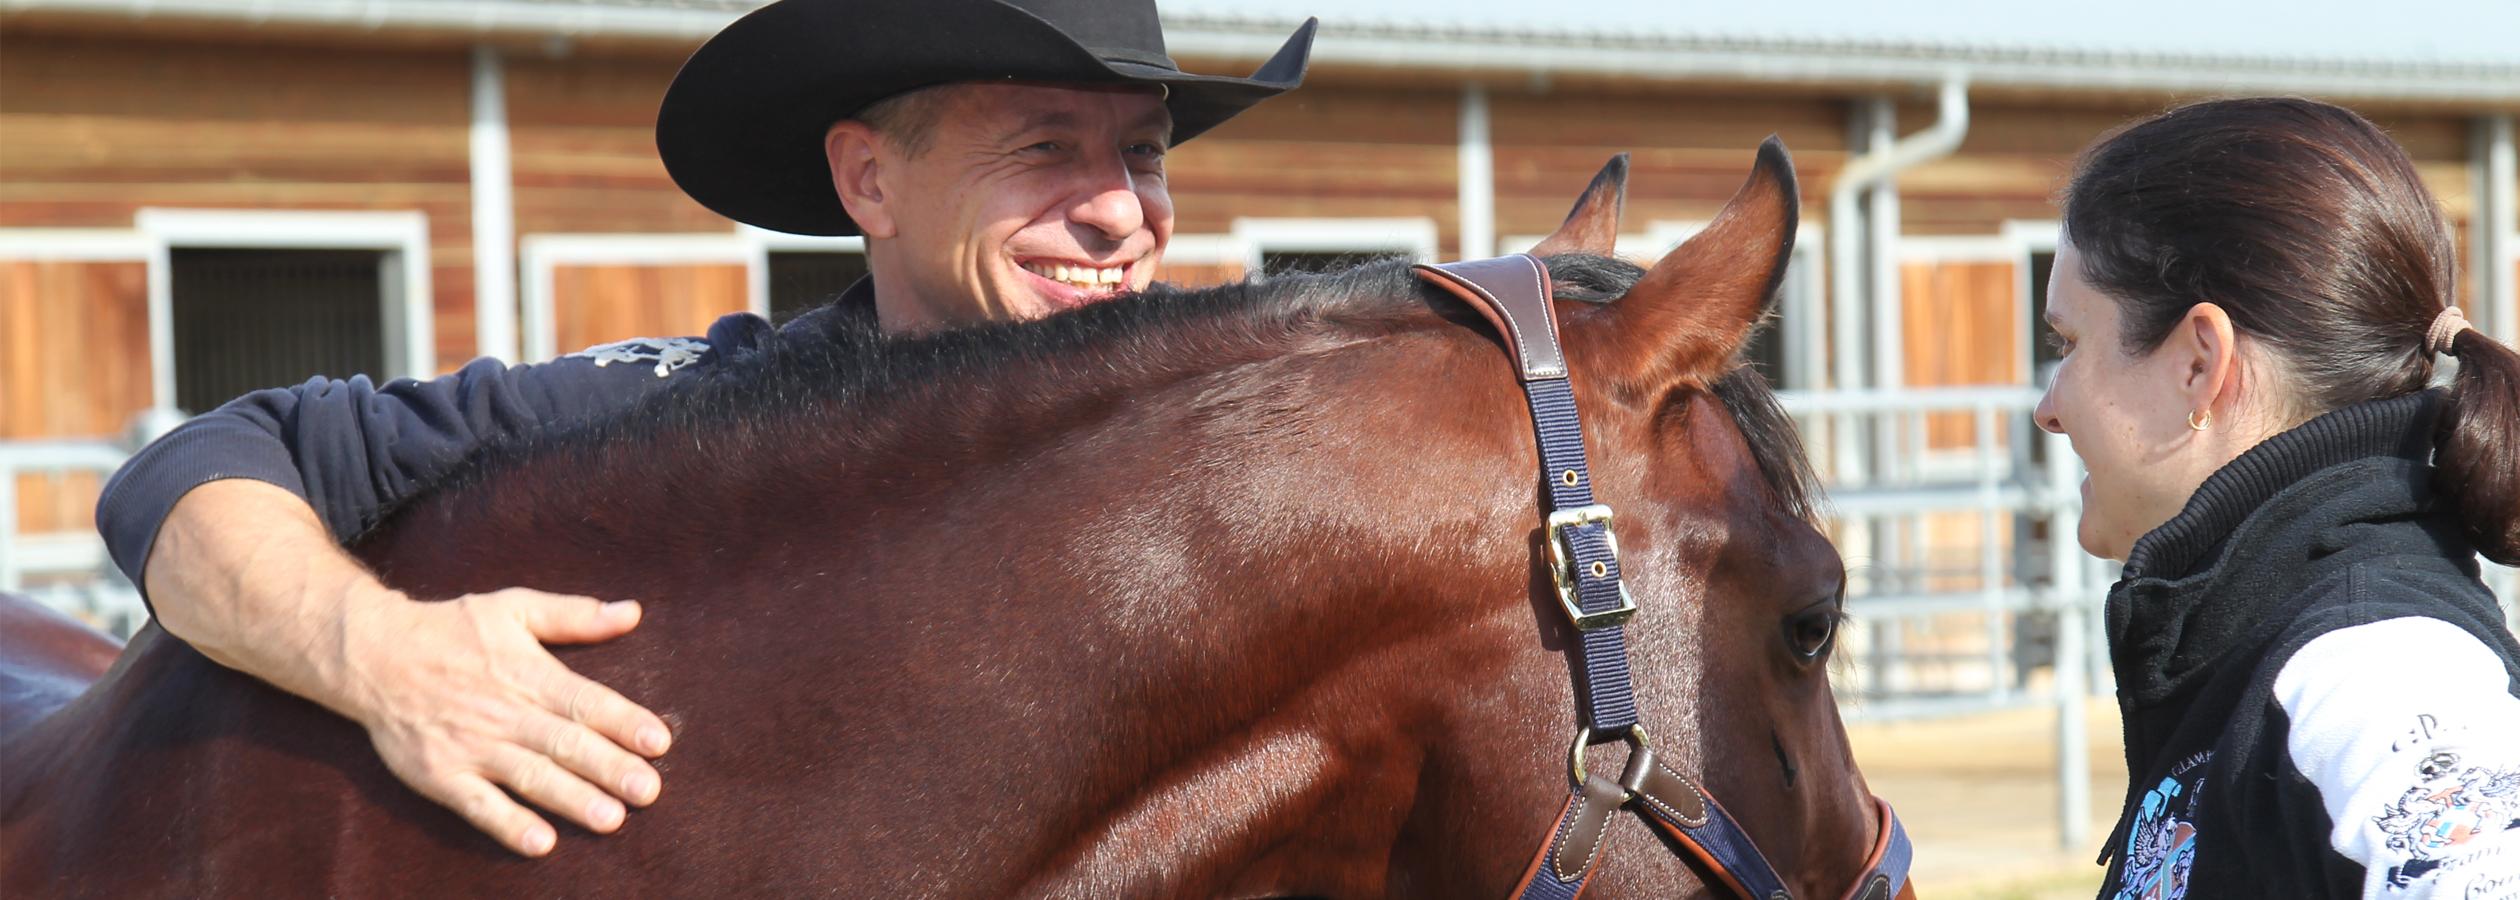 Header_HorseAcademy_Kalender-12